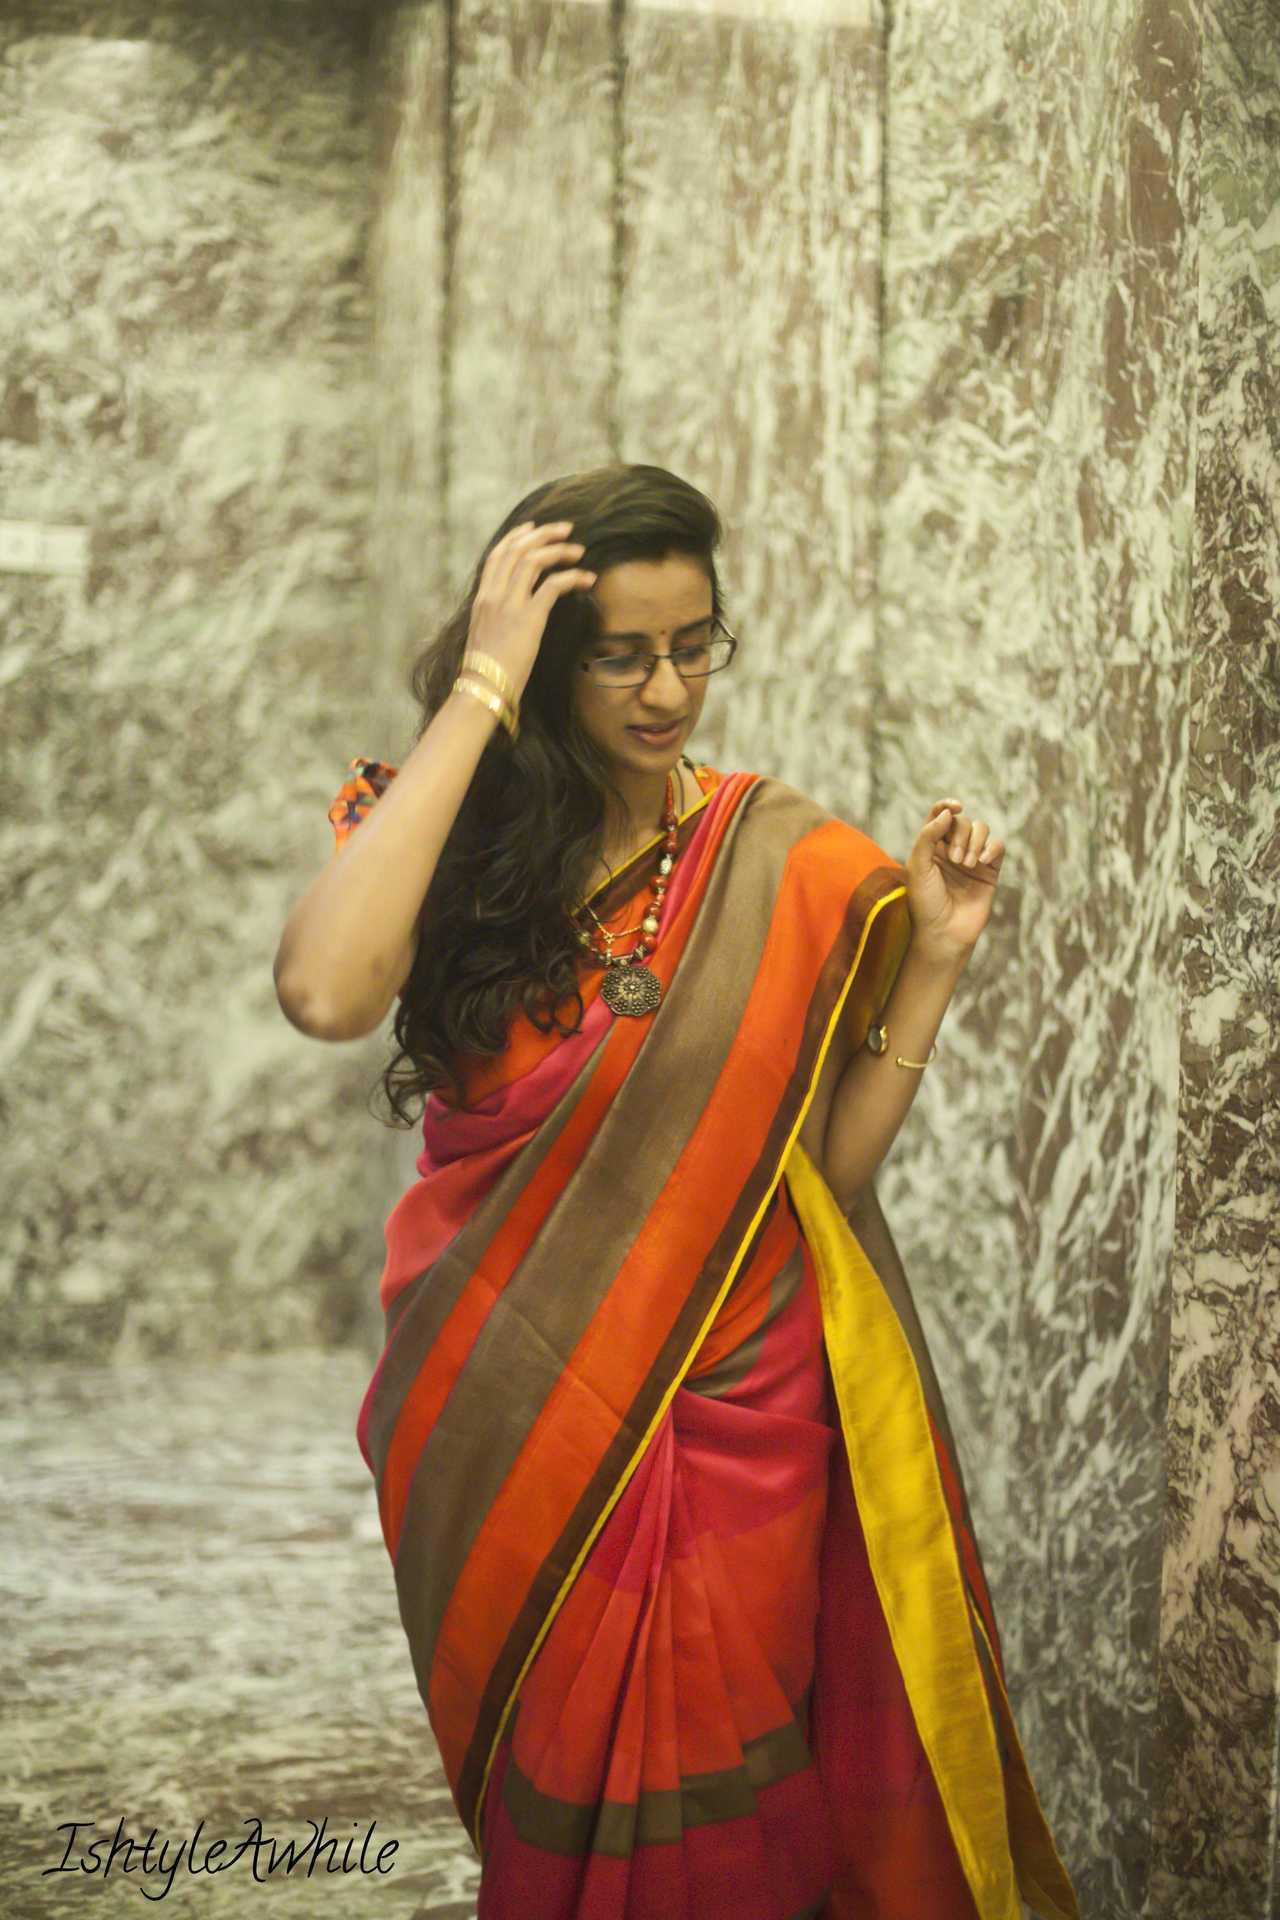 IshtyleAwhile - art silk sari styling